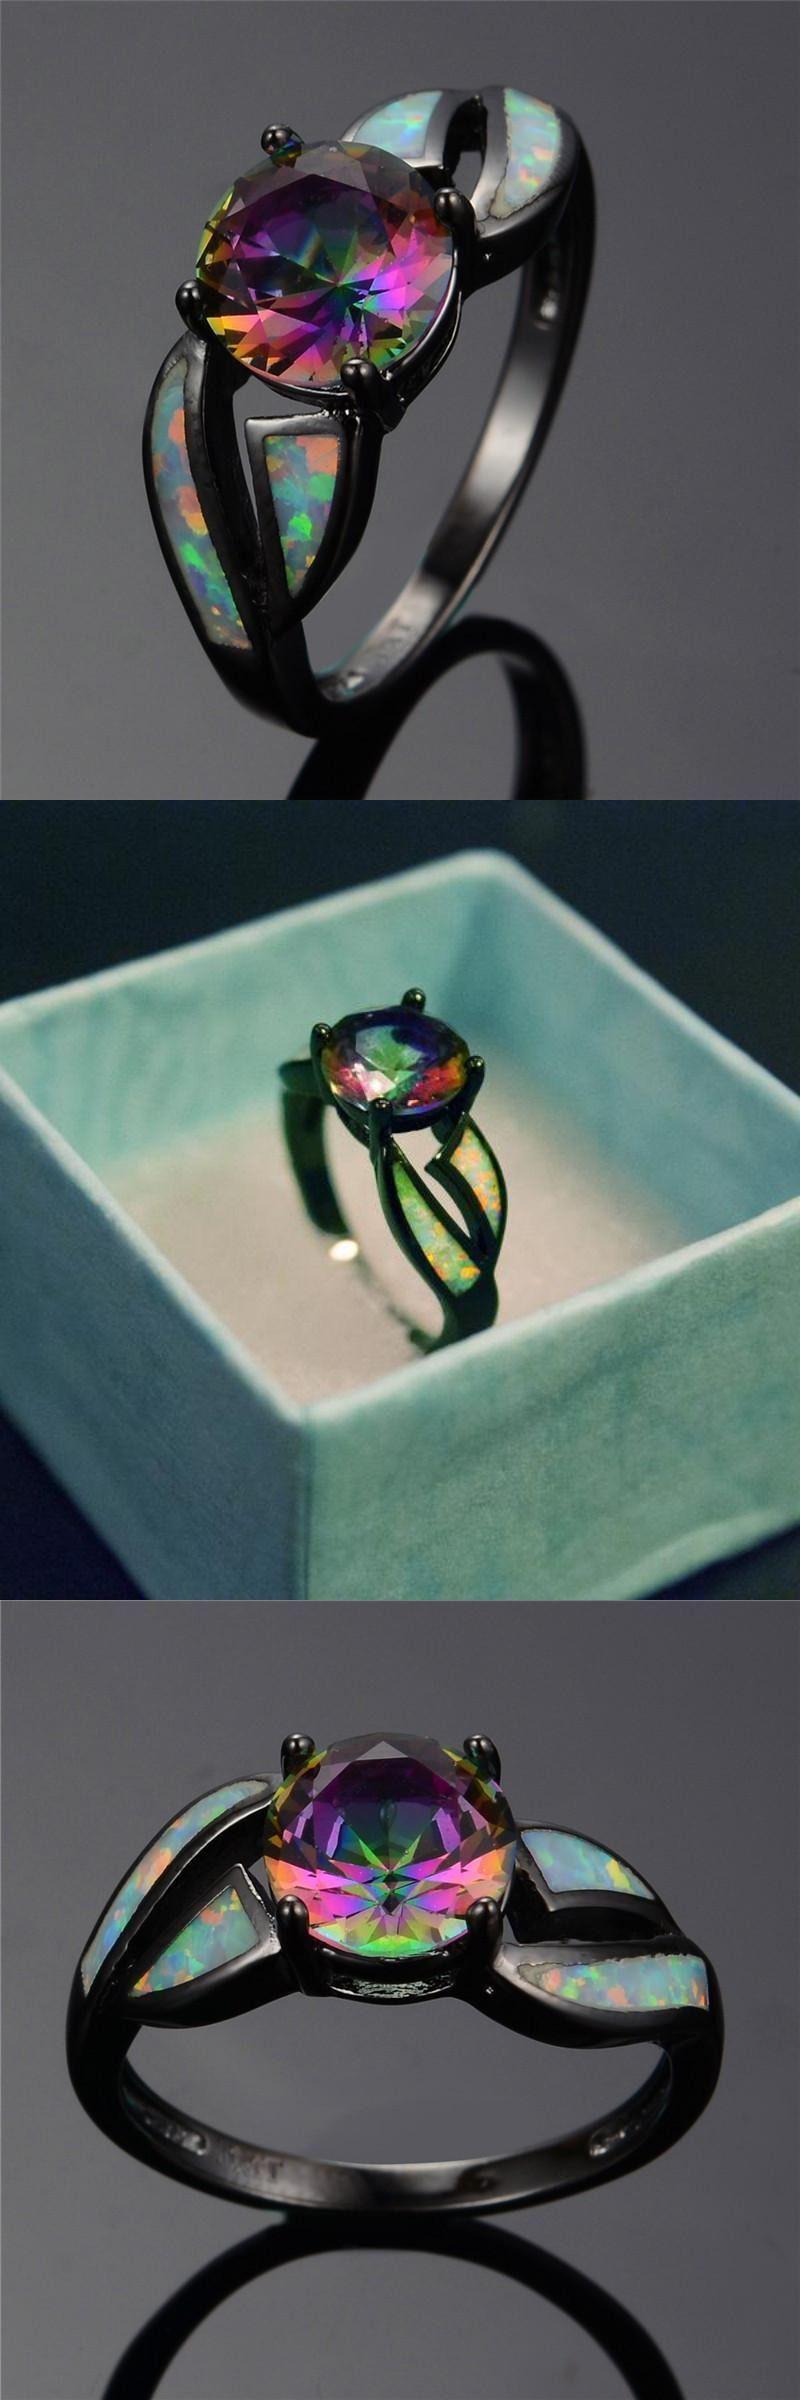 2018 Charming White Fire Opal Ring Colorful Men Women